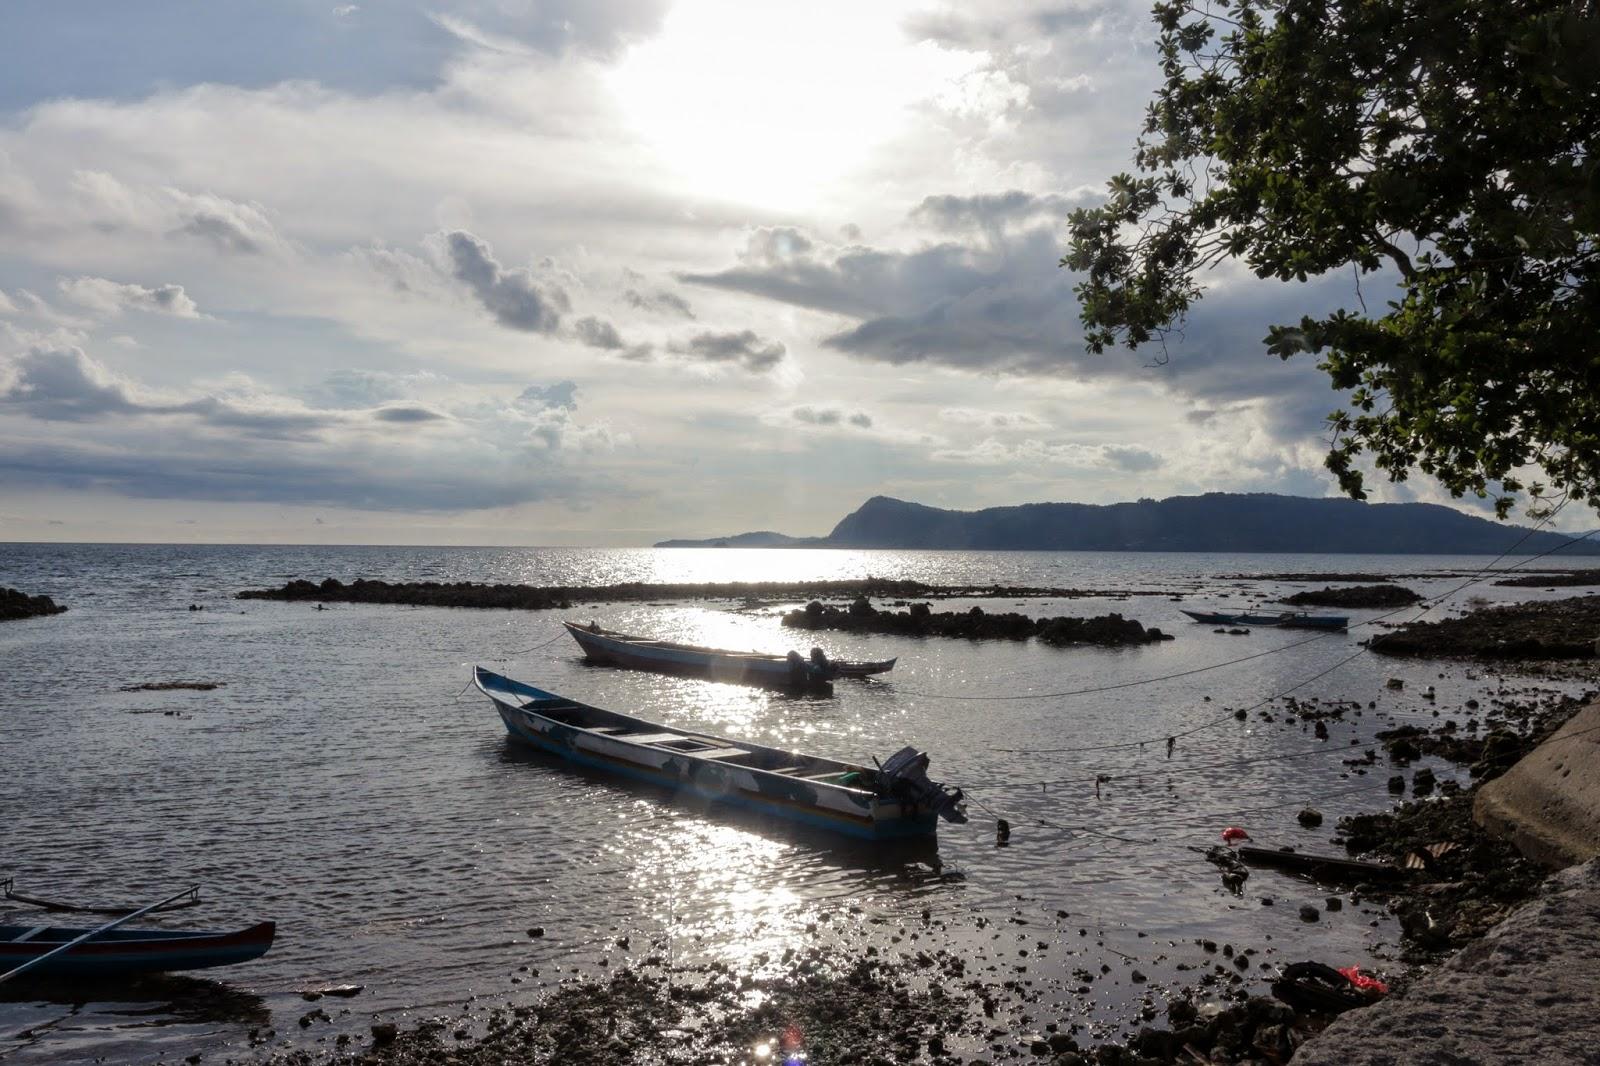 Negeri Ulath Ouw Saparua Maluku Tengah Manise Pesisir Pantai Wasisil